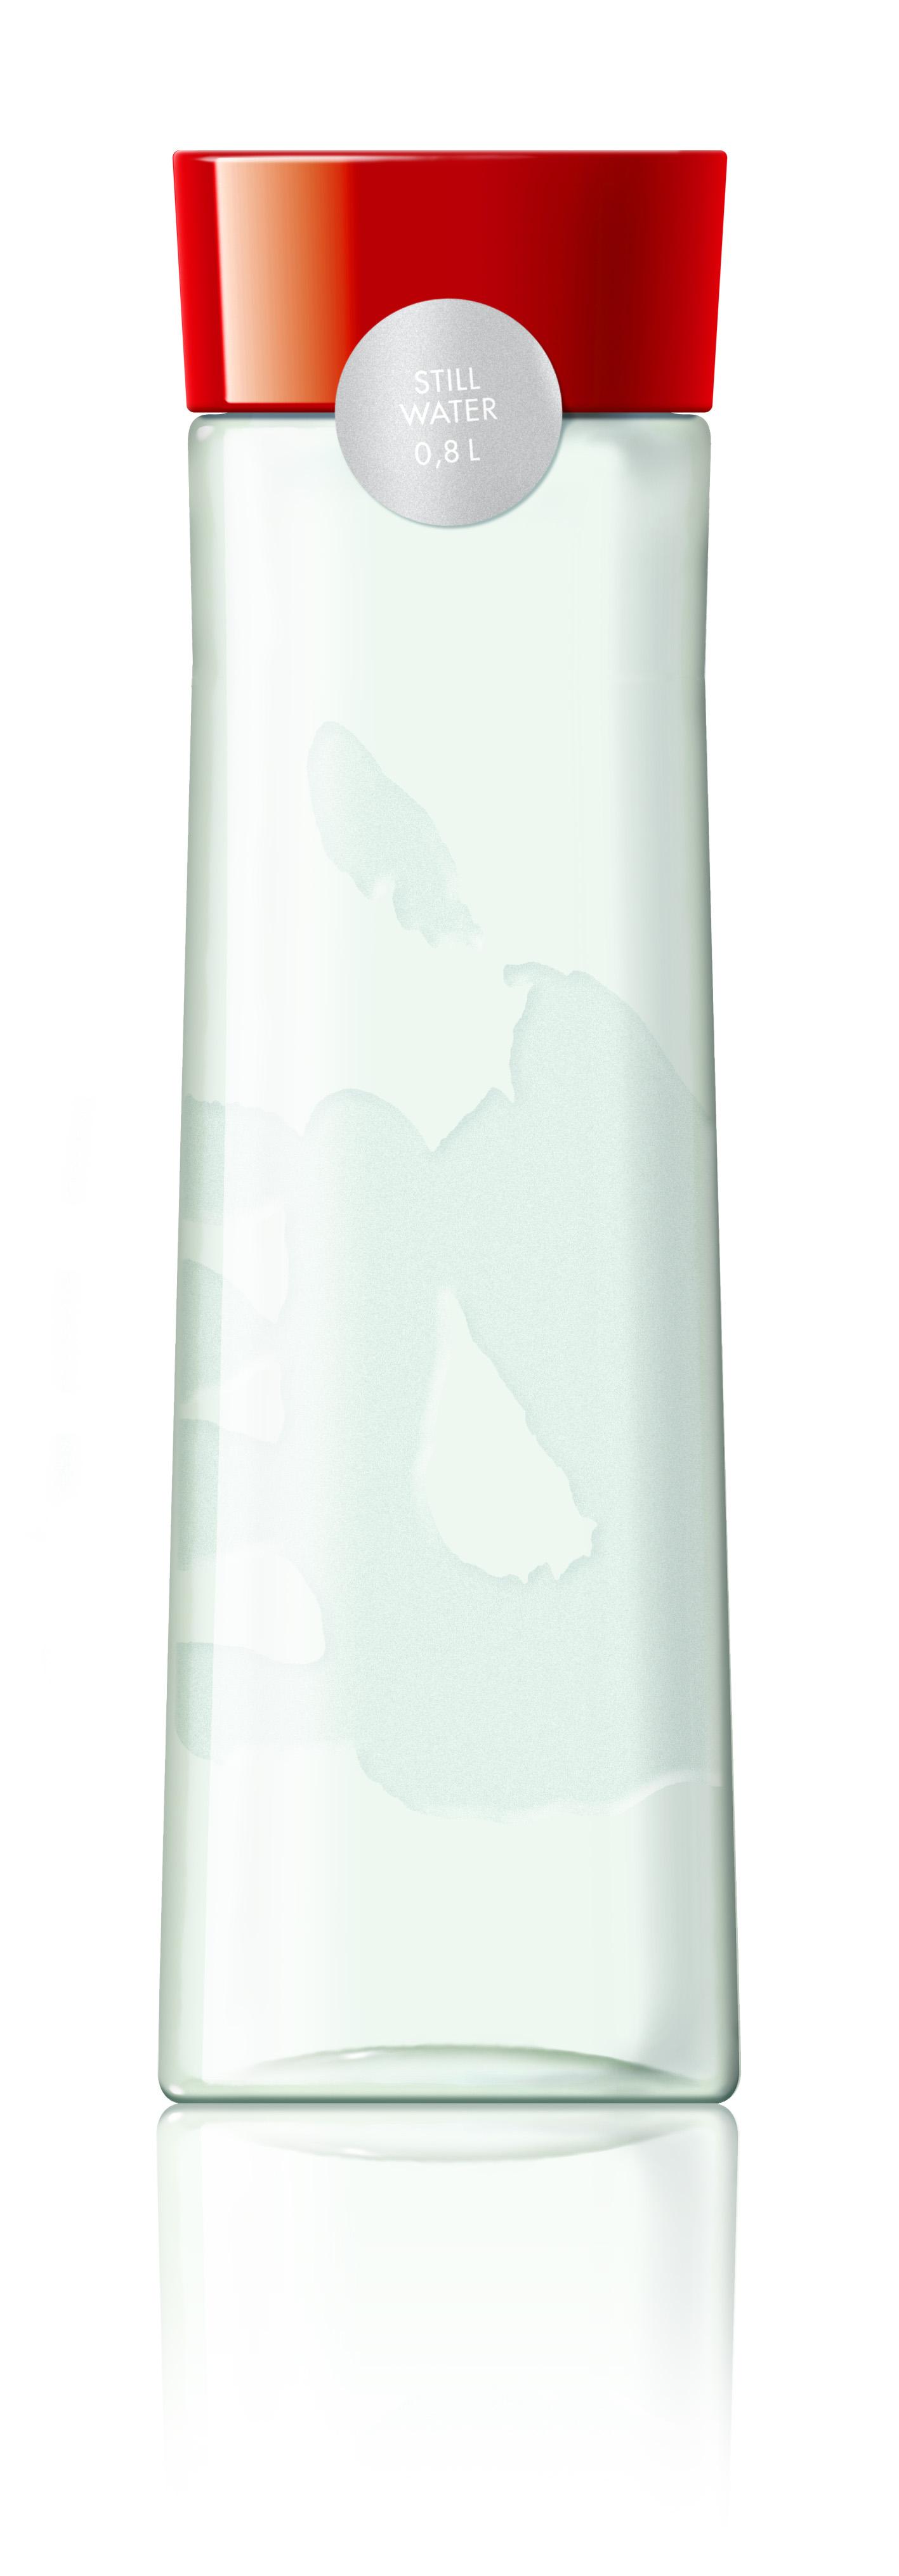 Scandics nya, designade vattenflaska